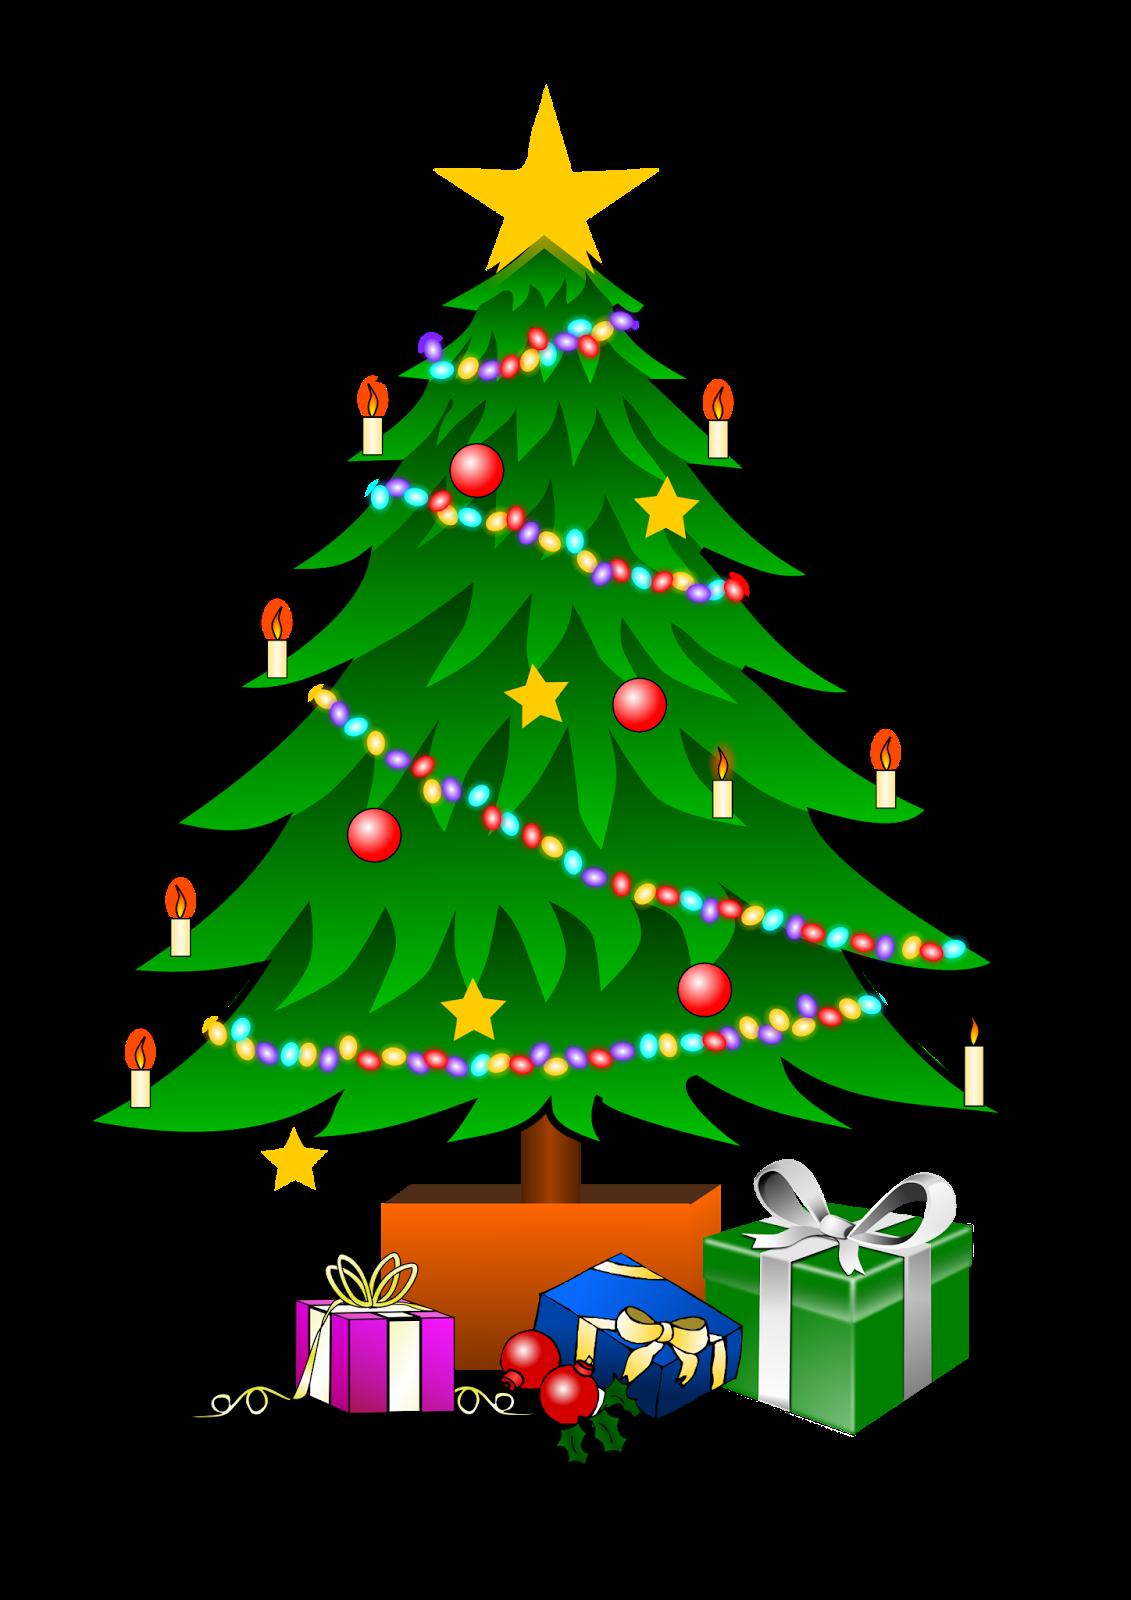 Christmas tree art christmas tree art projects for kids for Christmas tree arts and crafts